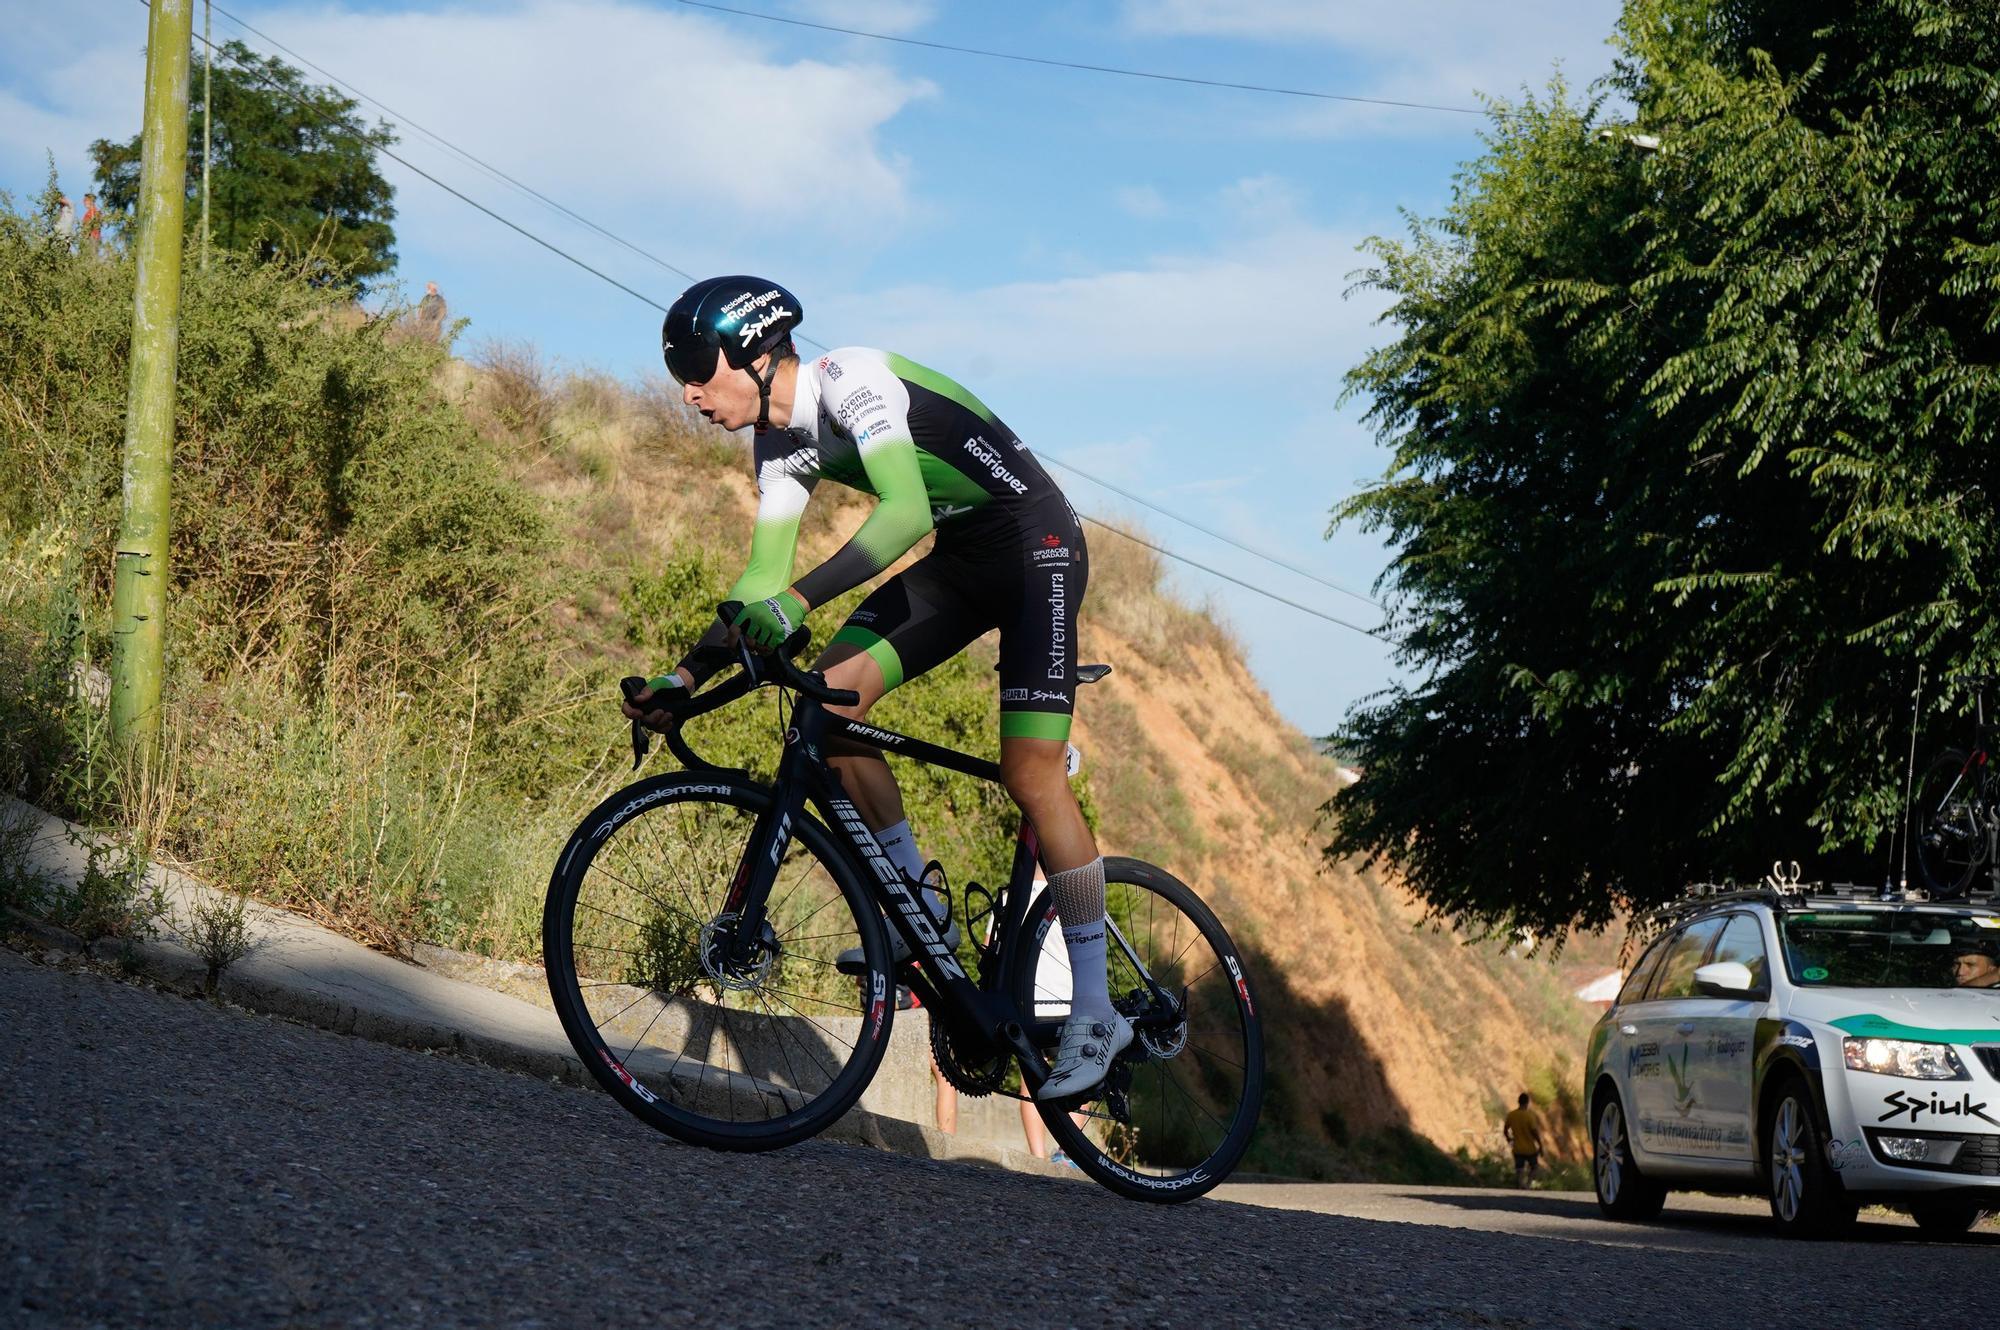 Vuelta Ciclista a Zammora - Primera etapa